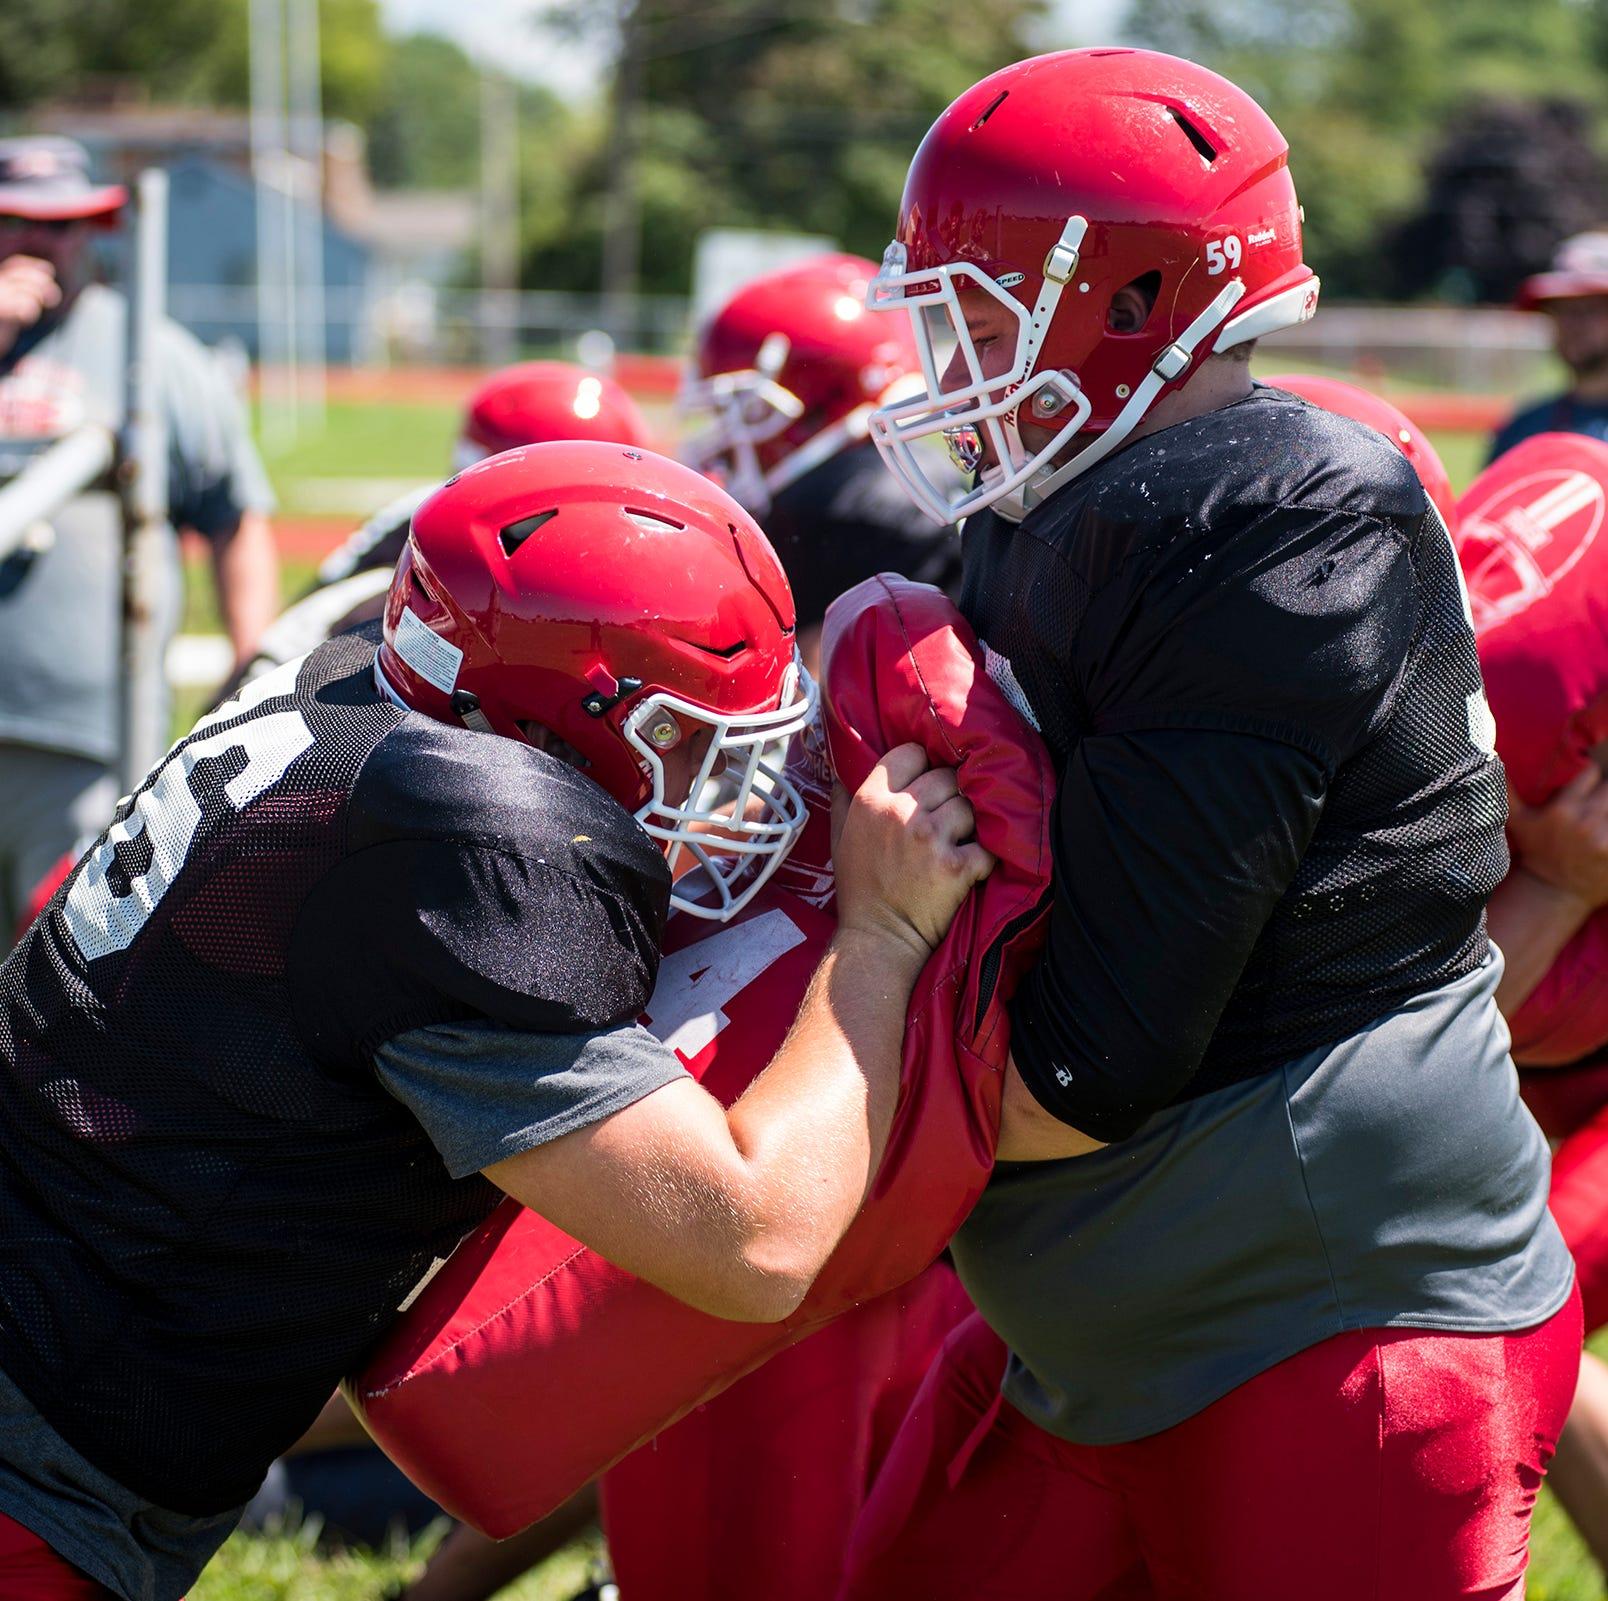 Port Huron football motivated to return to the postseason